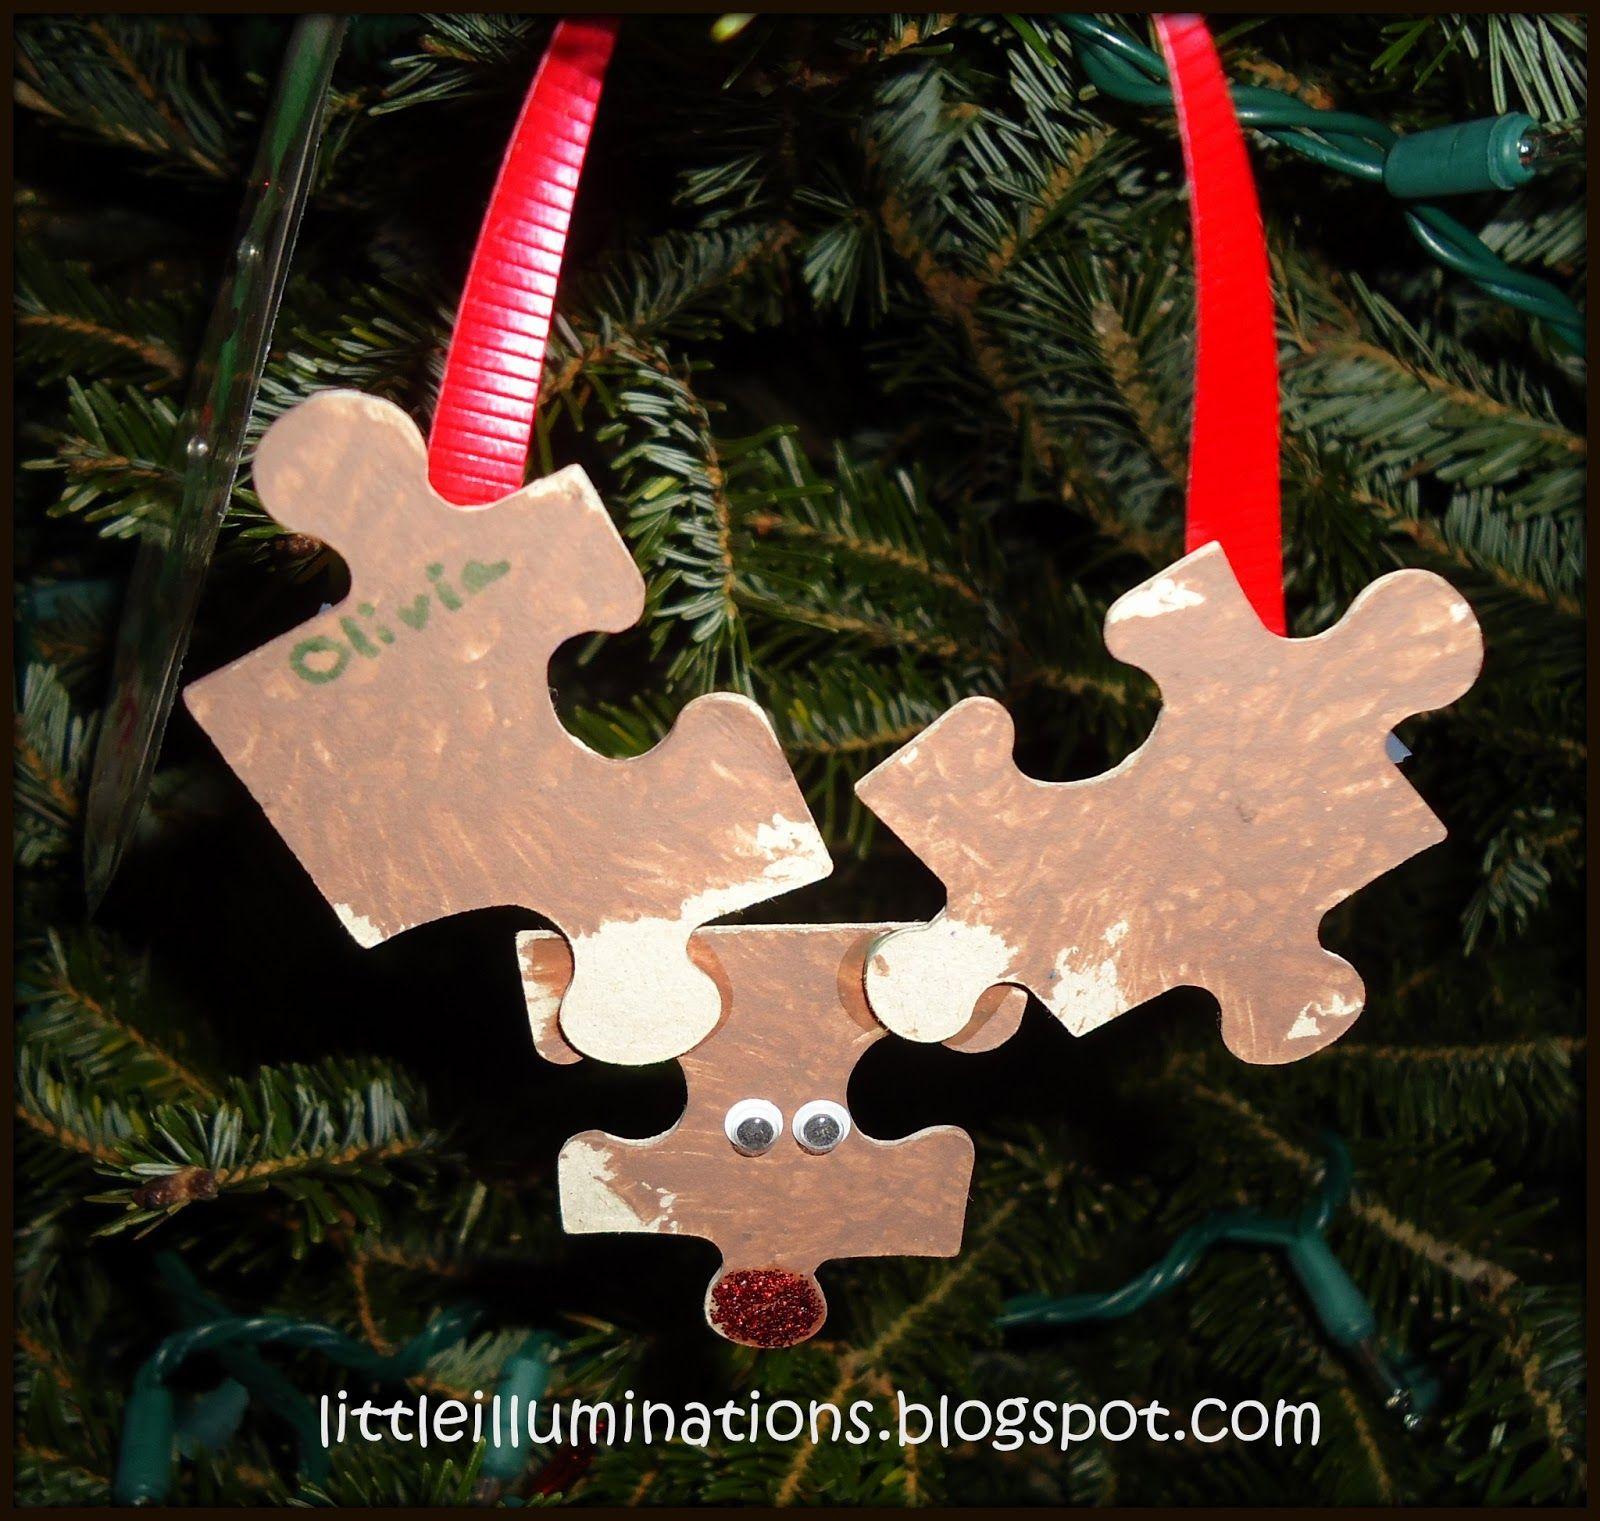 www.prekandksharing.blogspot.com | Christmas gifts for school ...